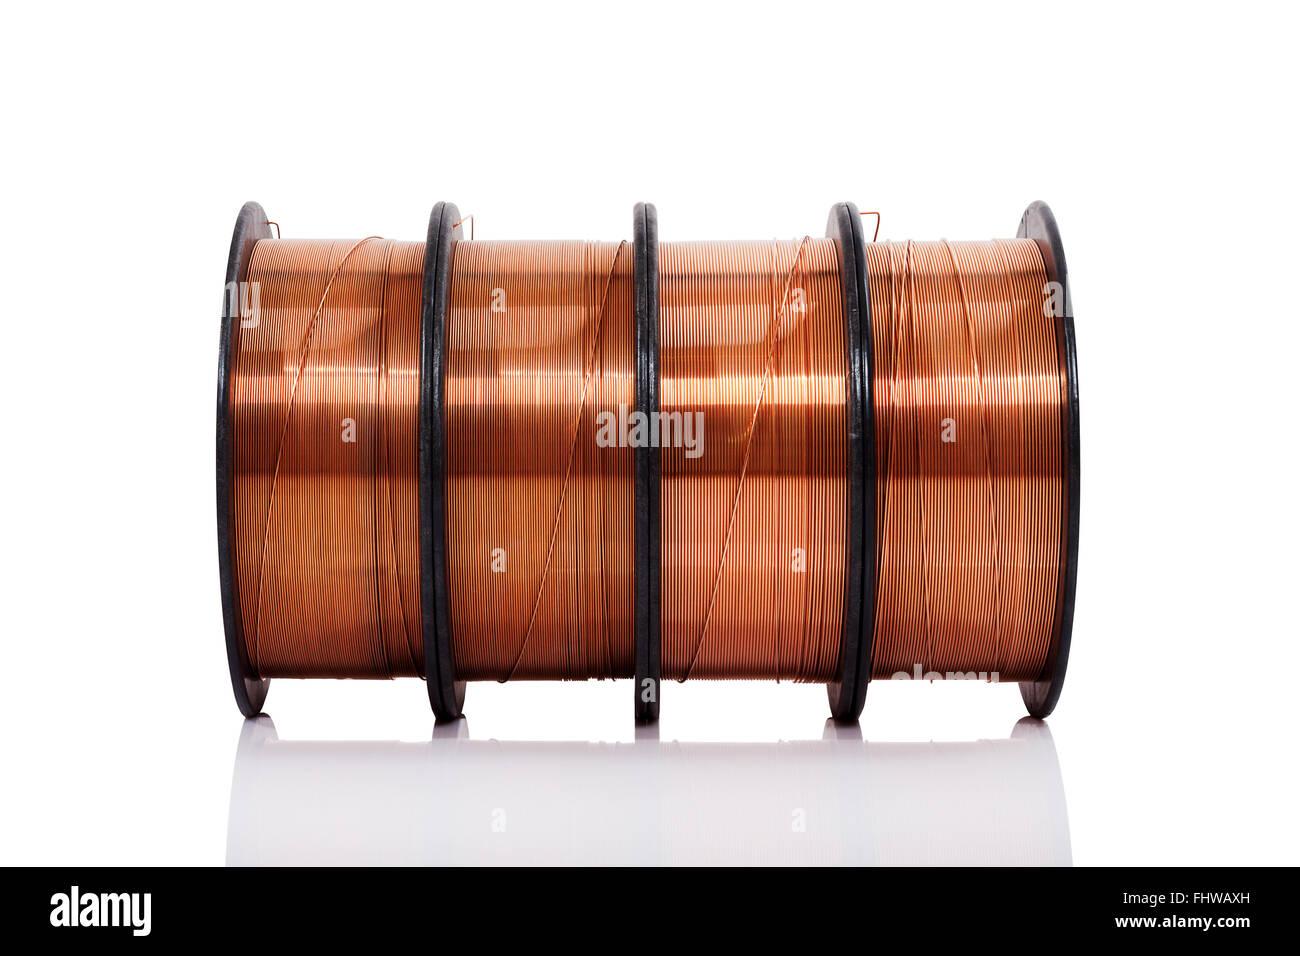 Copper Wire Stockfotos & Copper Wire Bilder - Alamy